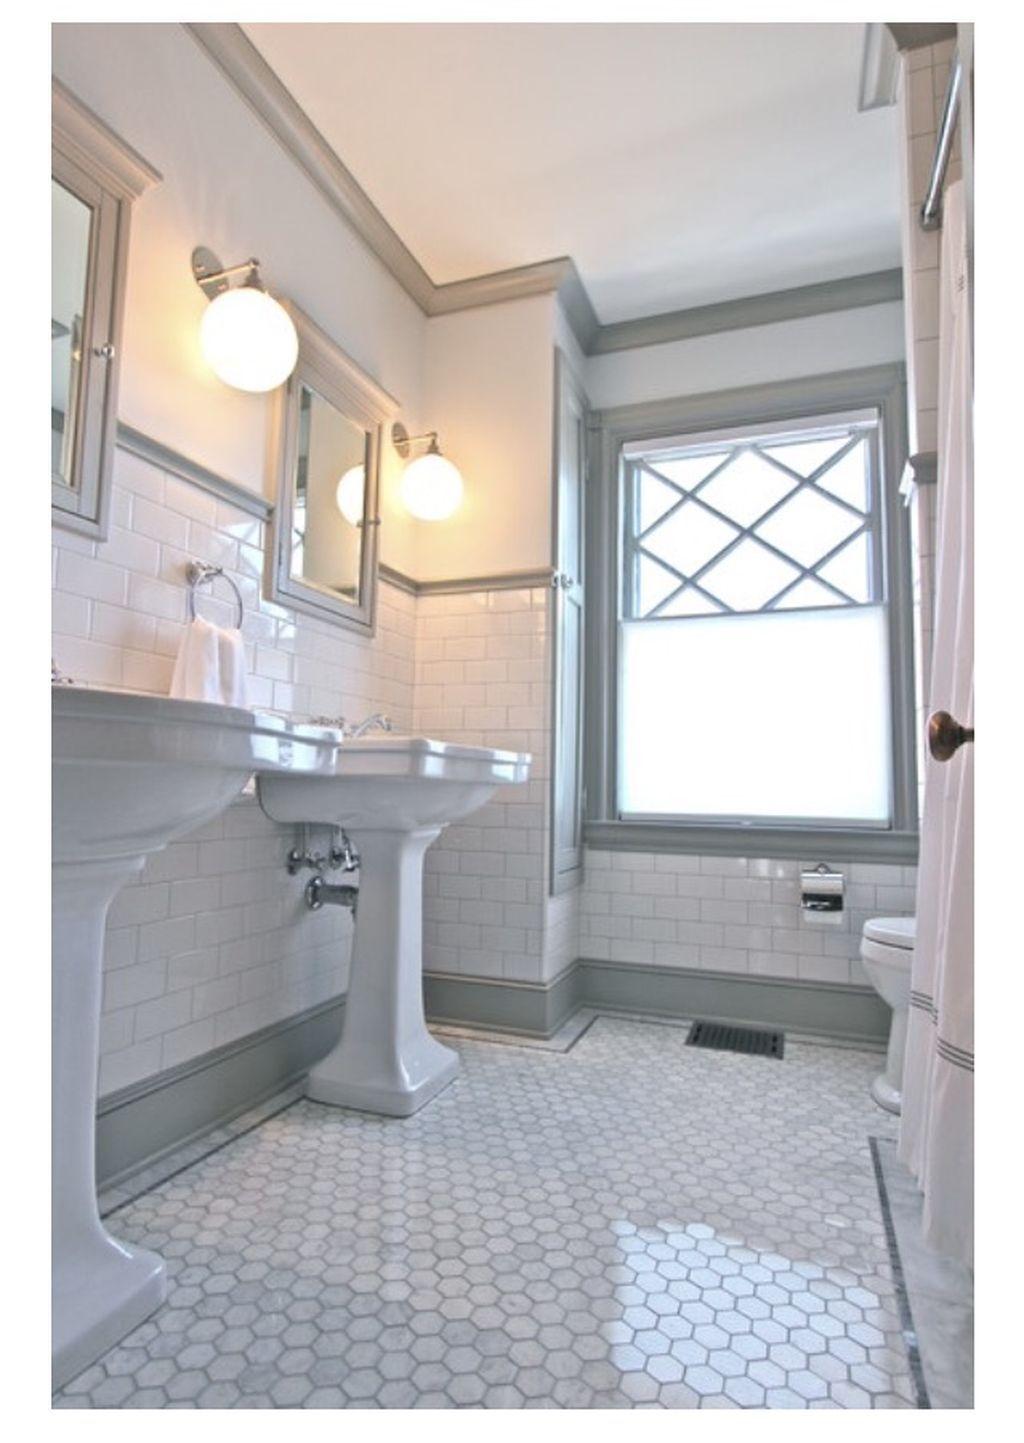 Incredibly Subway Tiles Bathroom Ideas With White Cabinets 14 Victorian Bathroom Bathrooms Remodel Bathroom Wall Colors Victorian bathroom design ideas